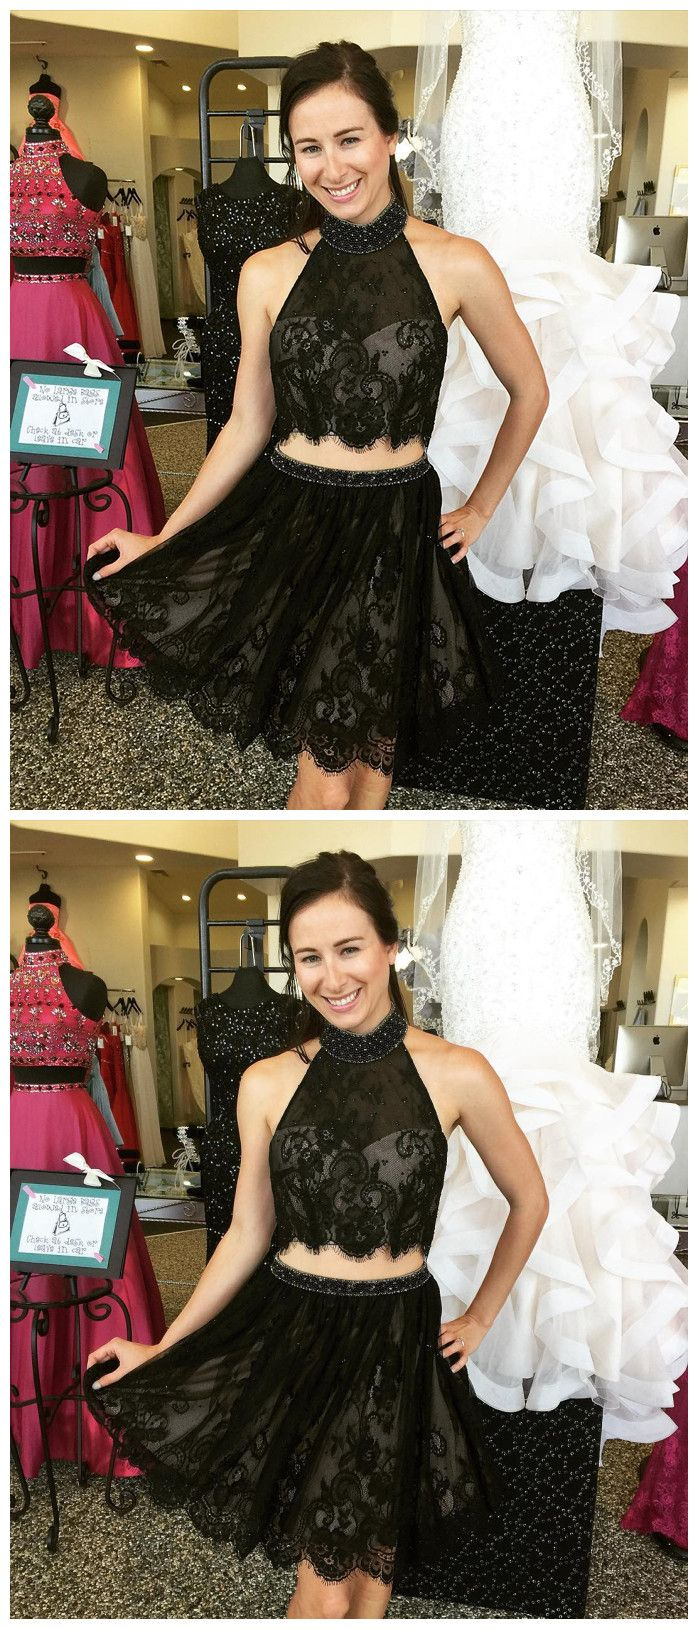 Homecoming dresscocktail dresshomecoming dressesblack lace two